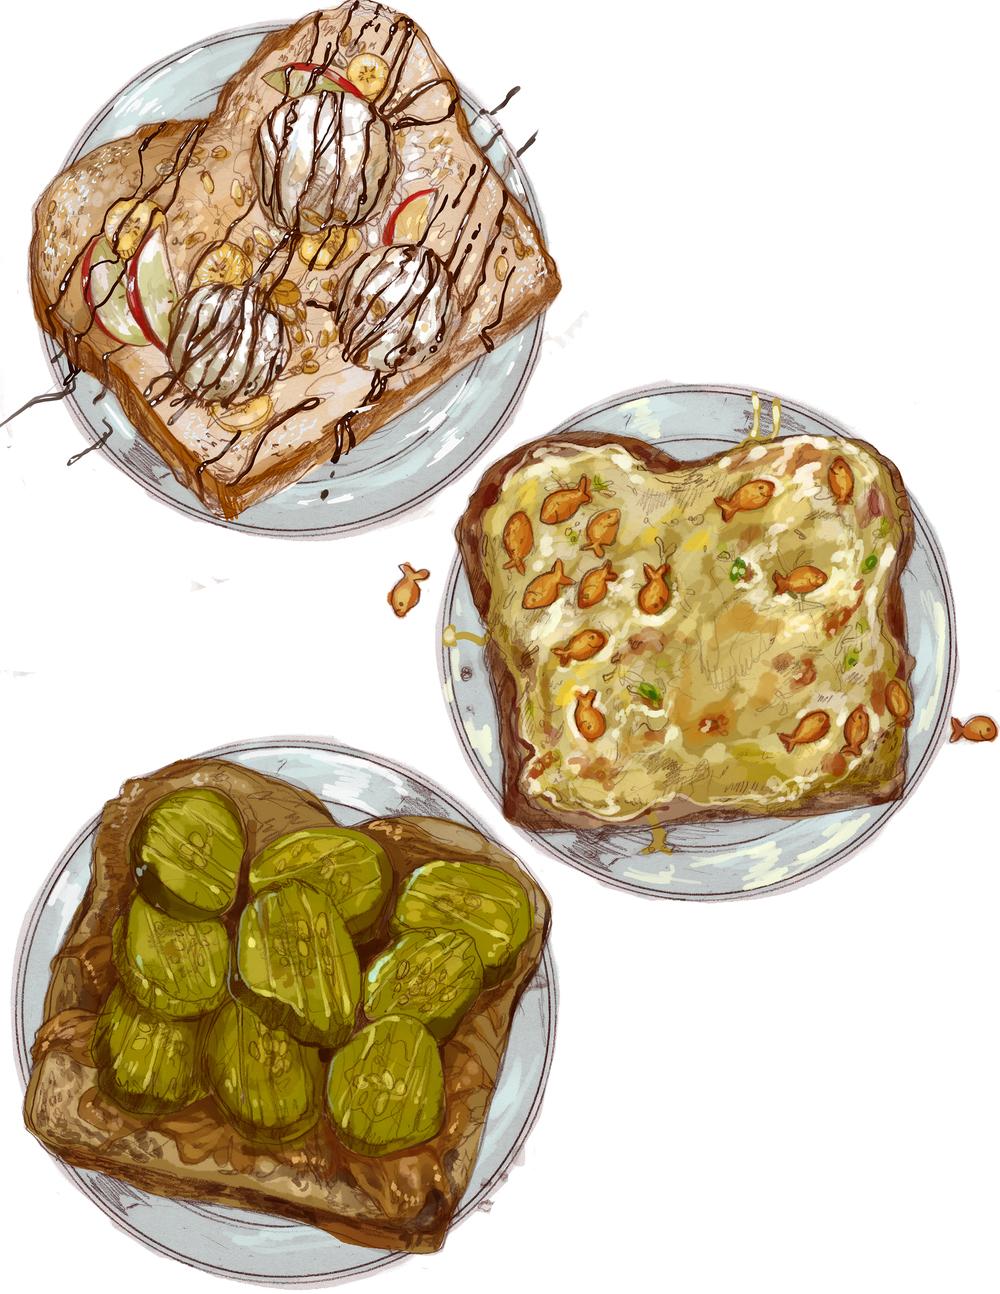 Sandwiches My Friends Eat